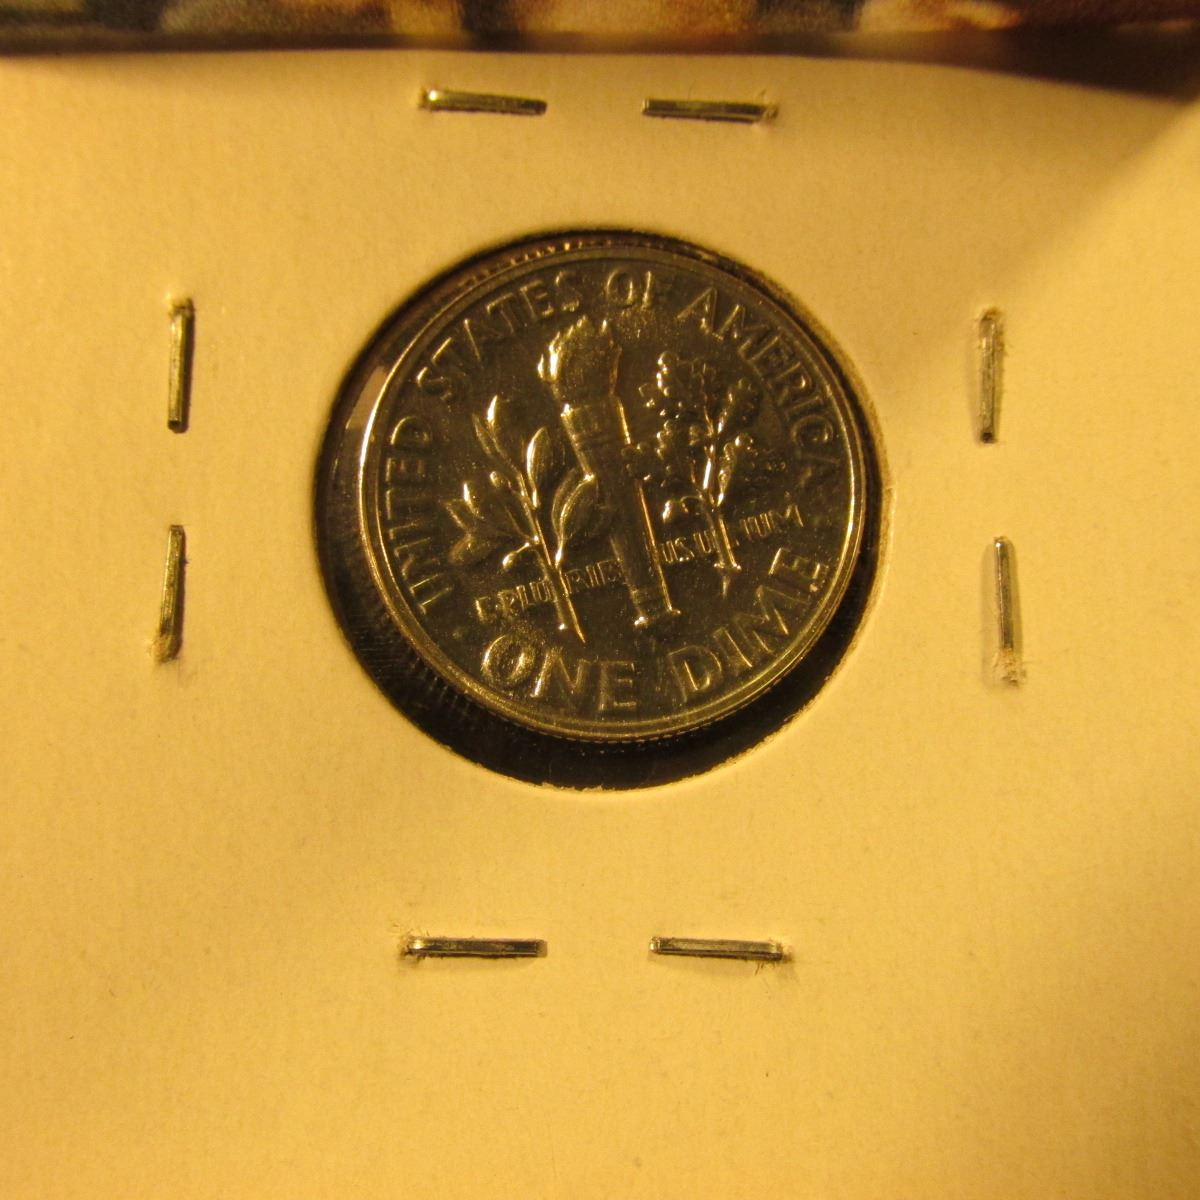 1956 Silver PROOF Roosevelt Dime, value $8